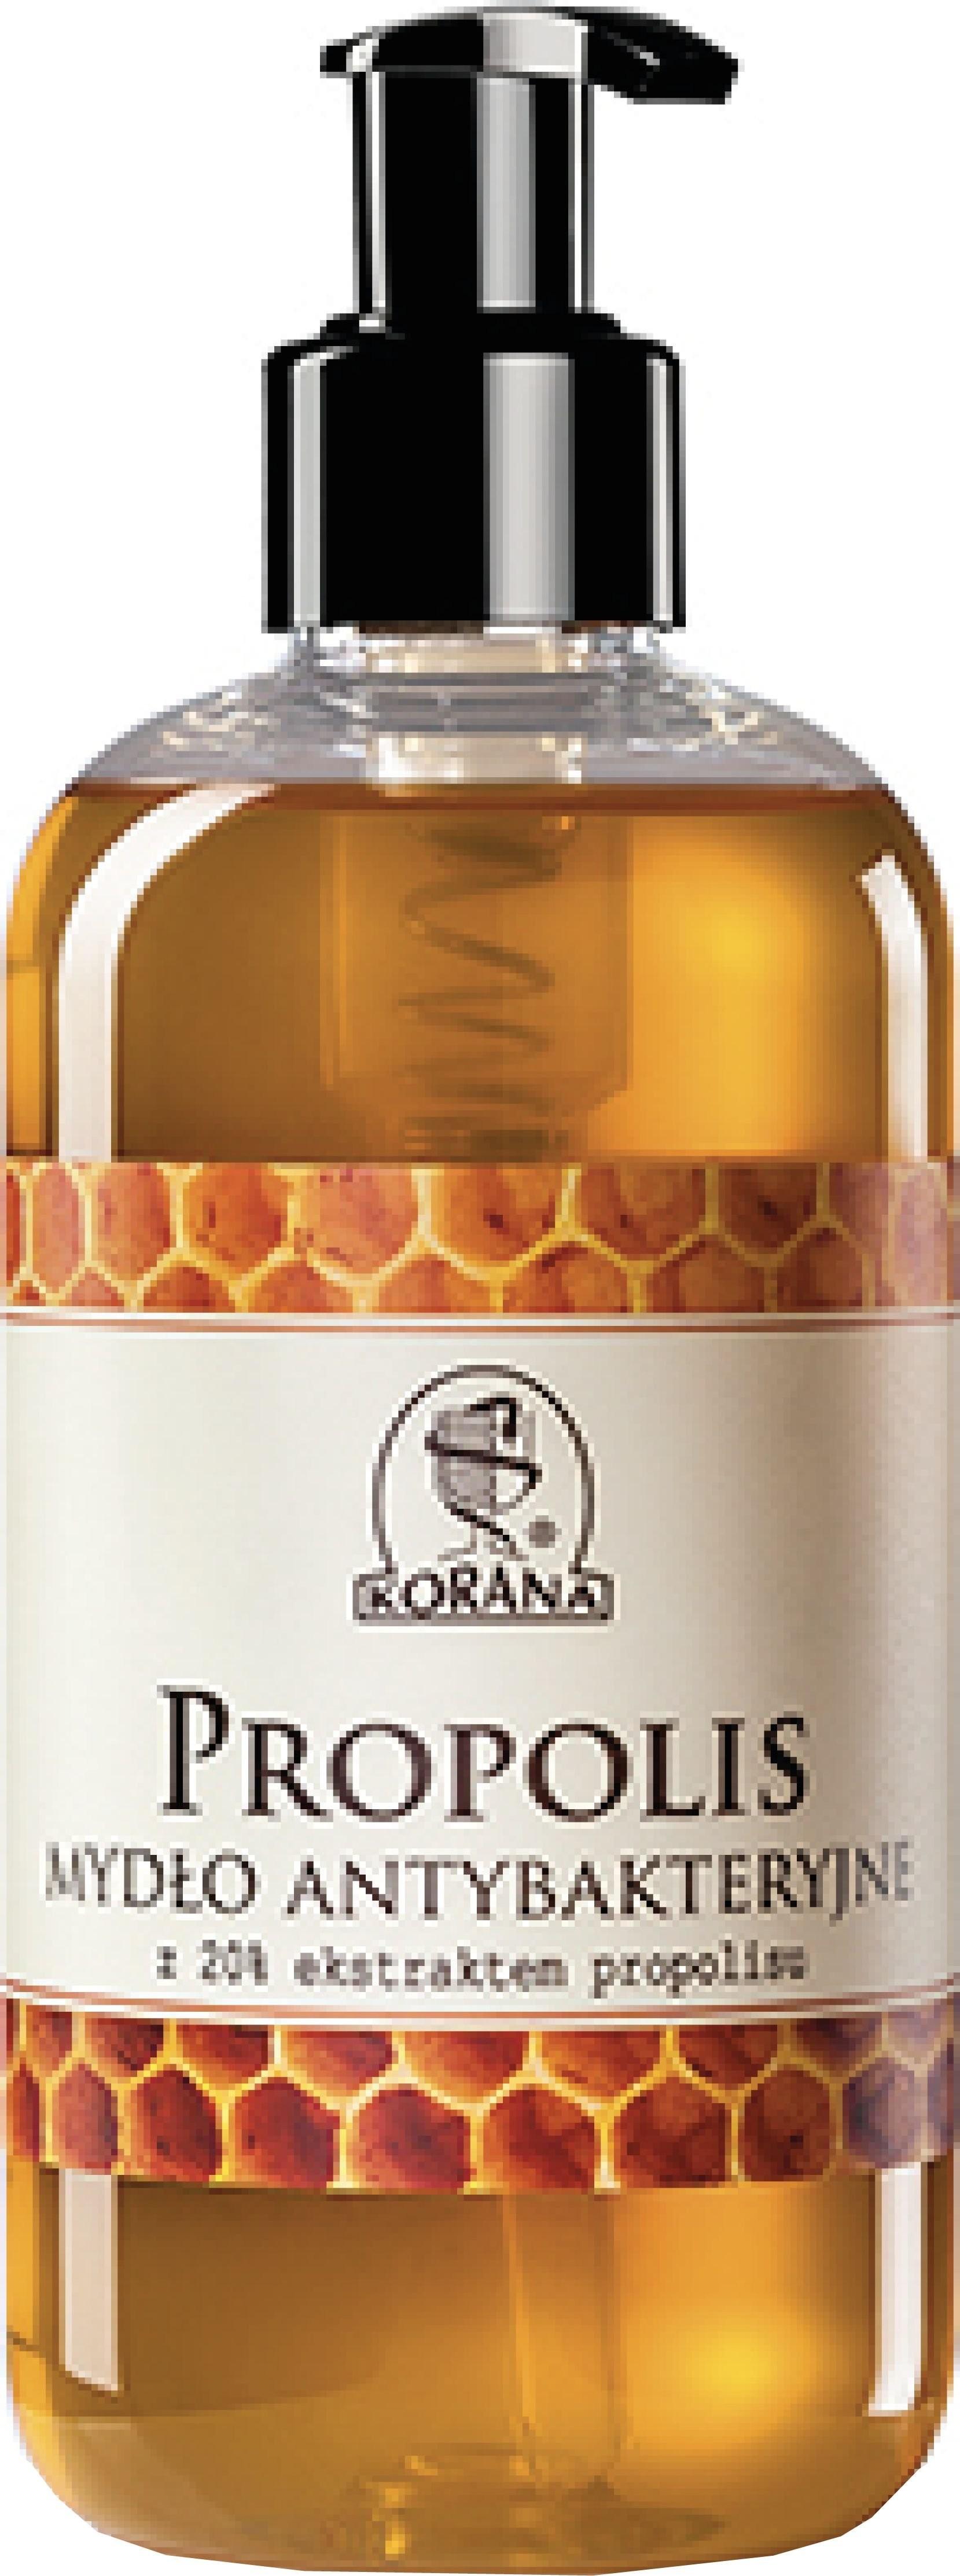 KORANA Propolis mydło ANTYBAKTERYJNE z 20% ekstraktem propolisu 5905829002912